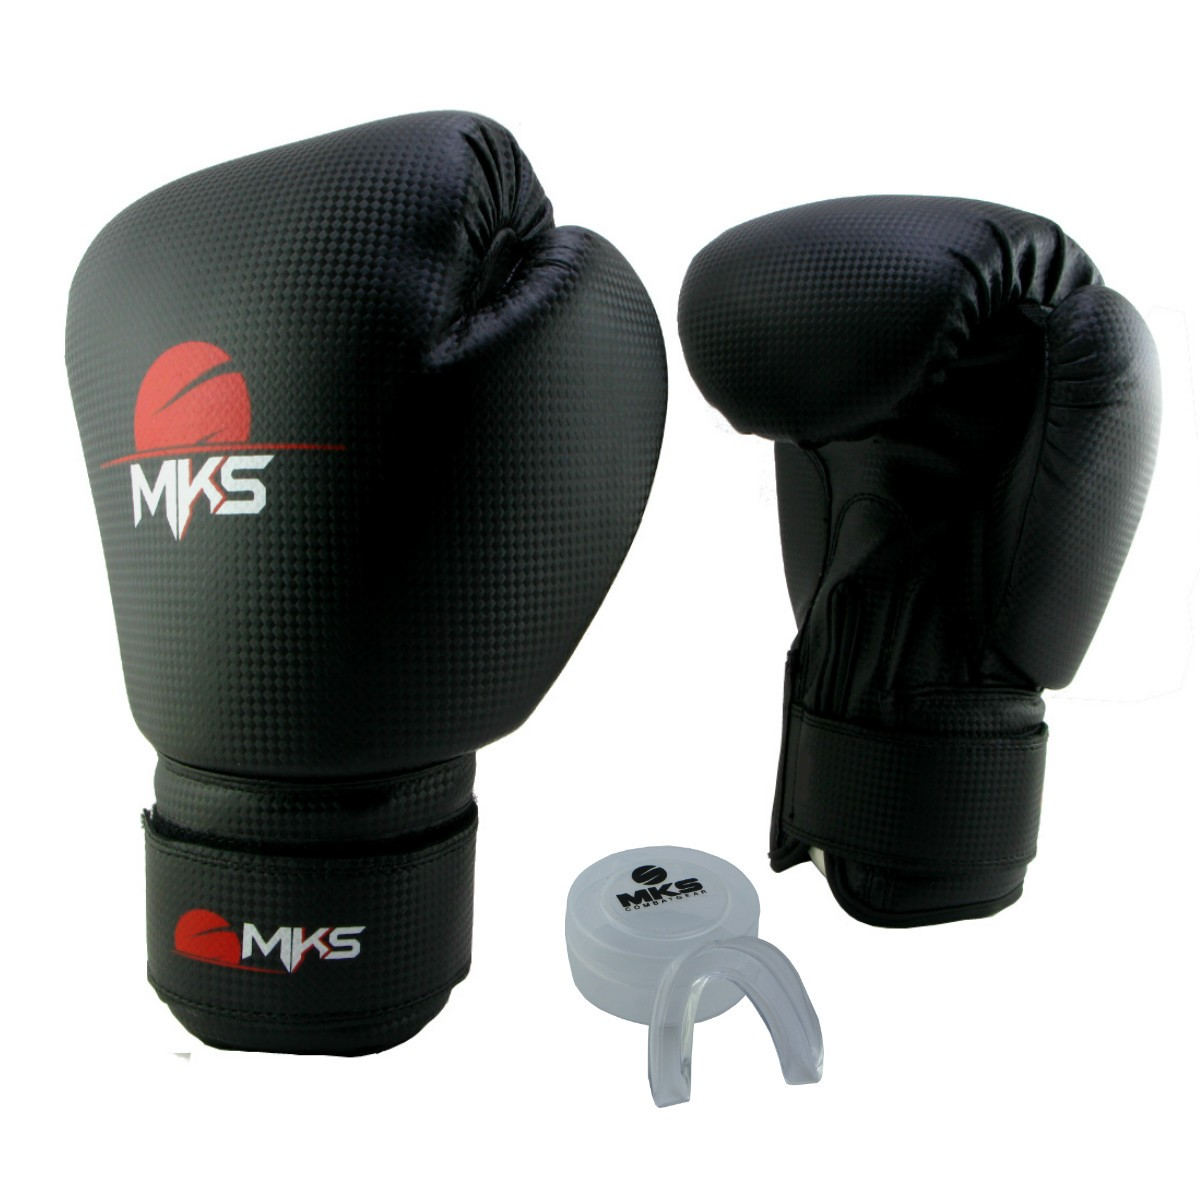 Luva de Boxe Prospect MKS Preta 14 oz + Protetor Bucal